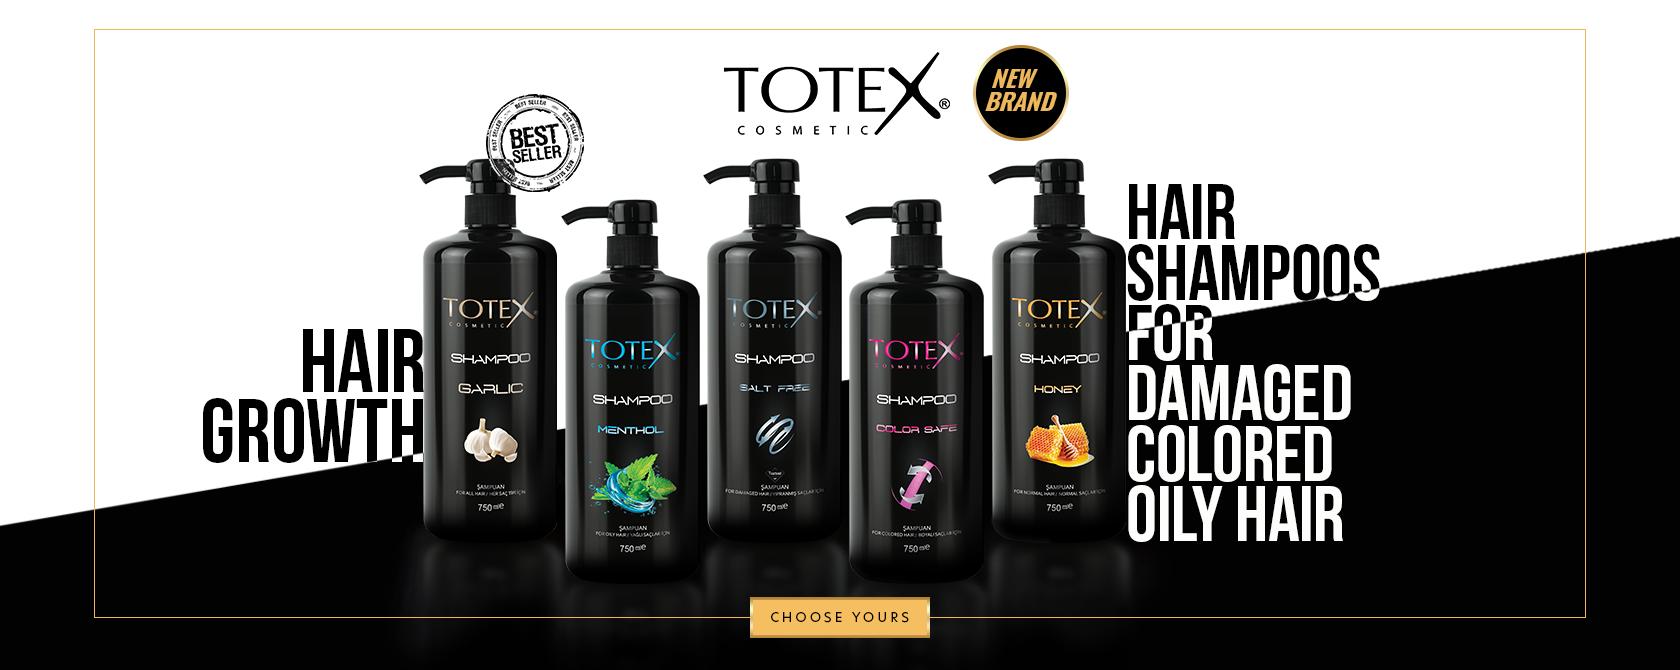 TOTEX Shampoo